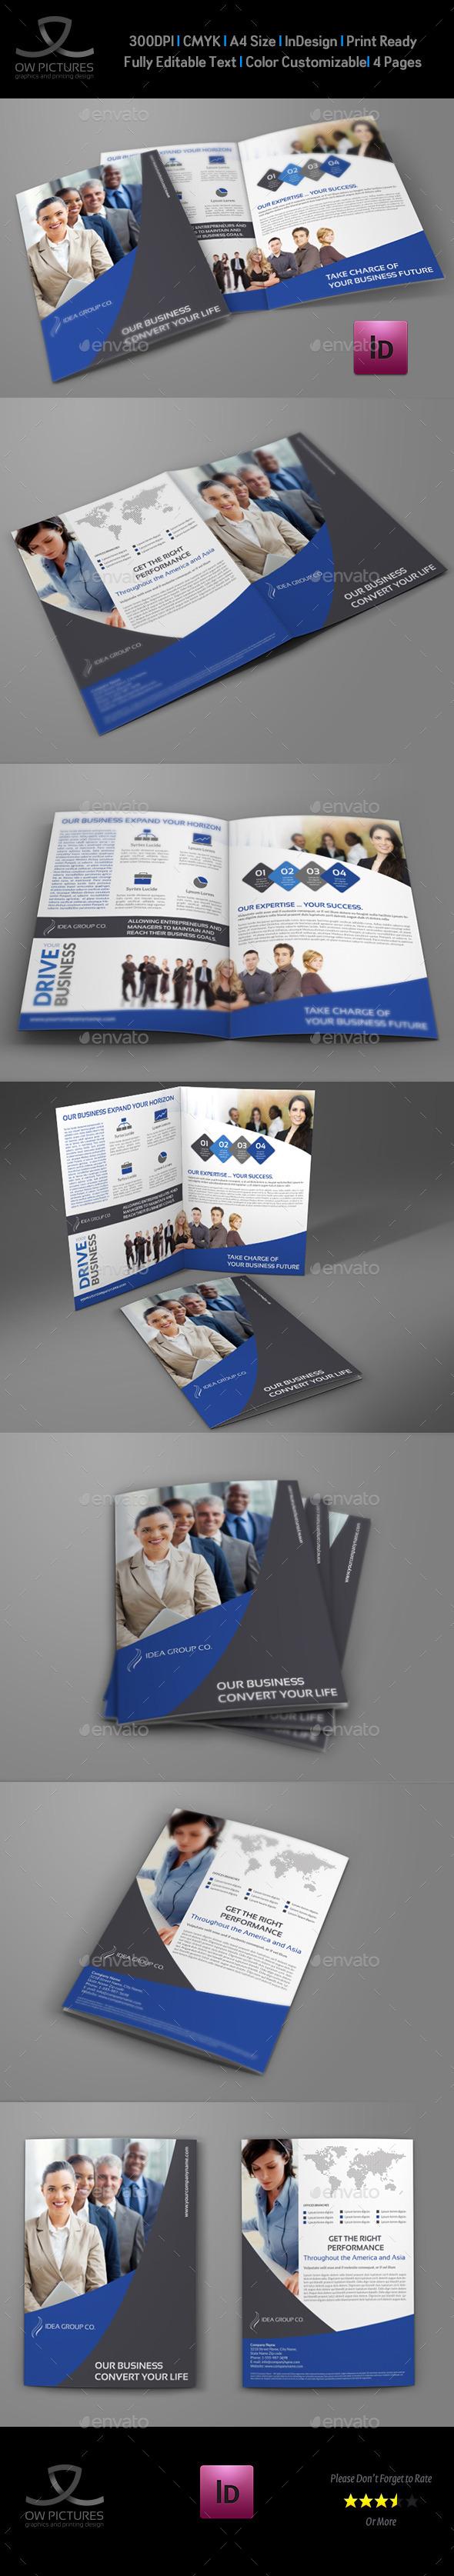 Company Brochure Bi-Fold Template Vol.31 - Corporate Brochures